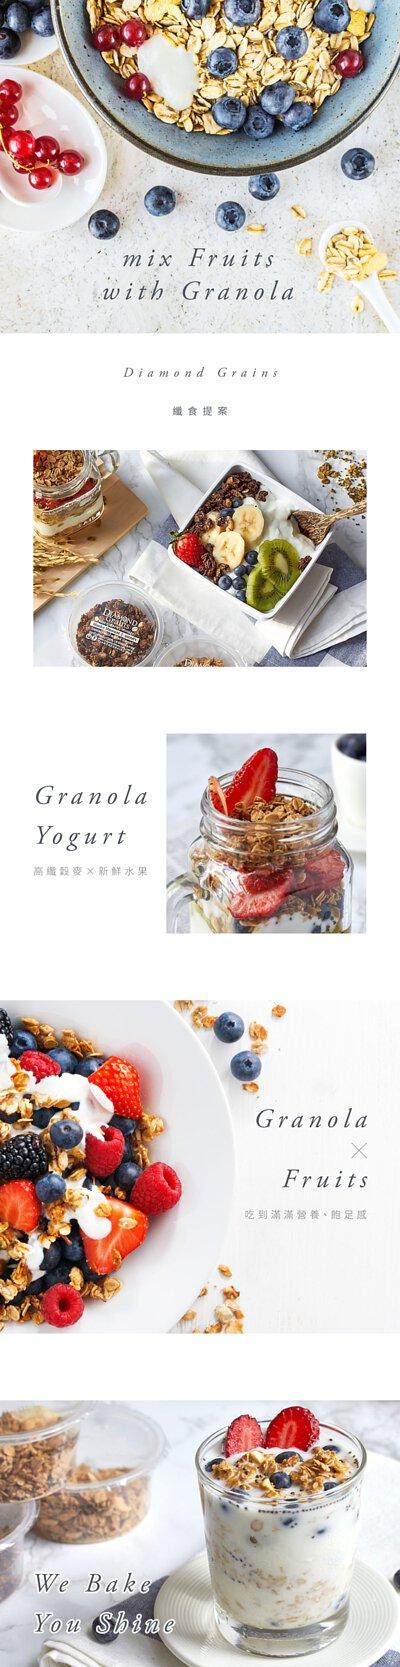 Diamond Grains 燕麥穀脆片 泰國銷售第一穀麥品牌 愛戀莓果 草莓